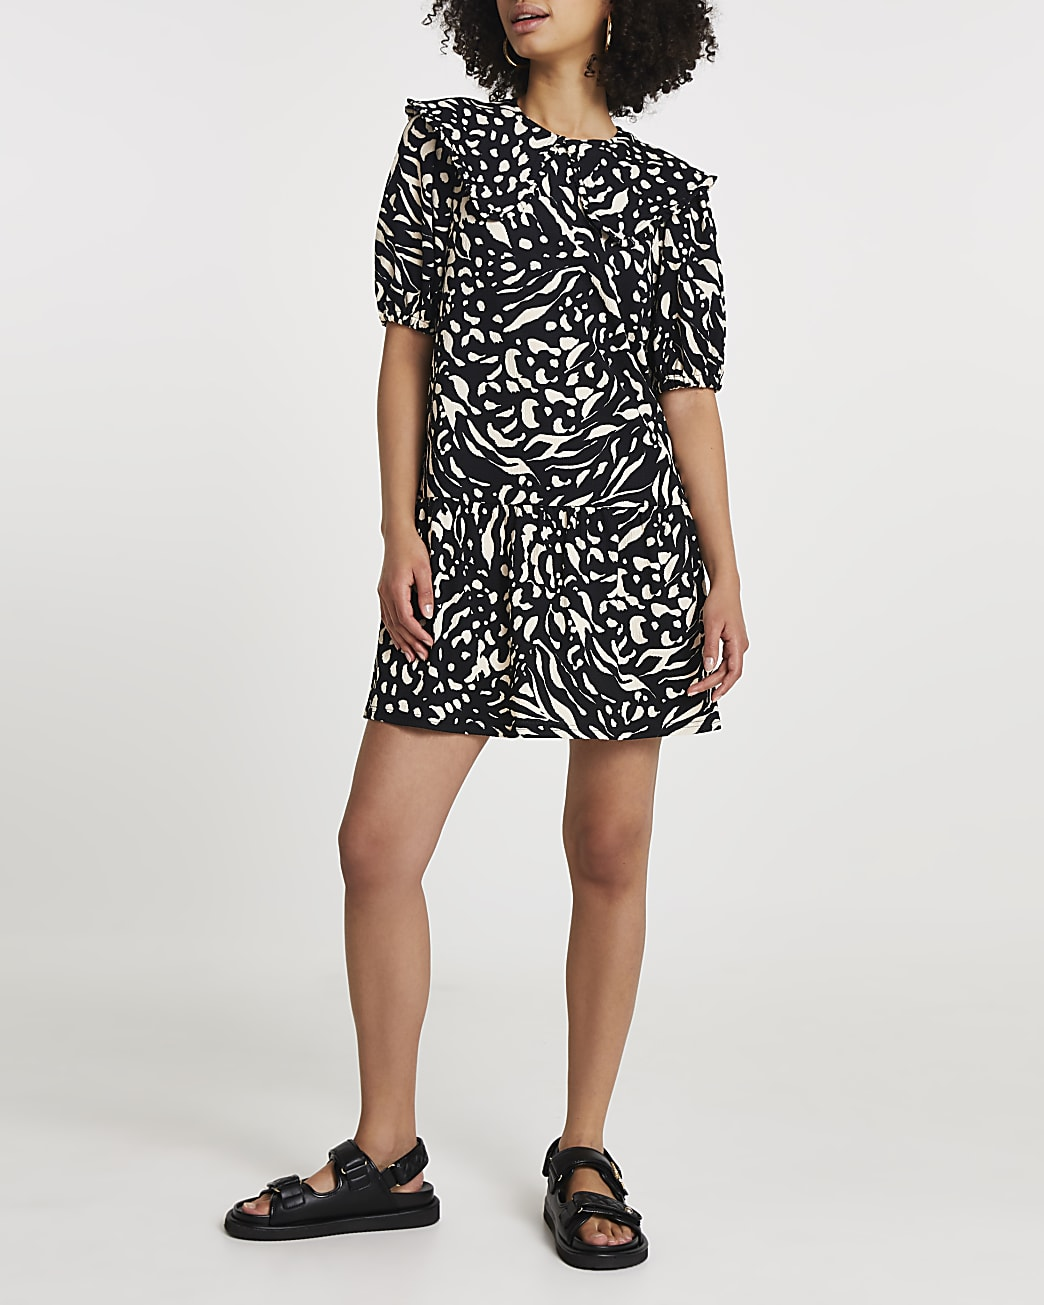 Brown animal print collared tiered mini dress